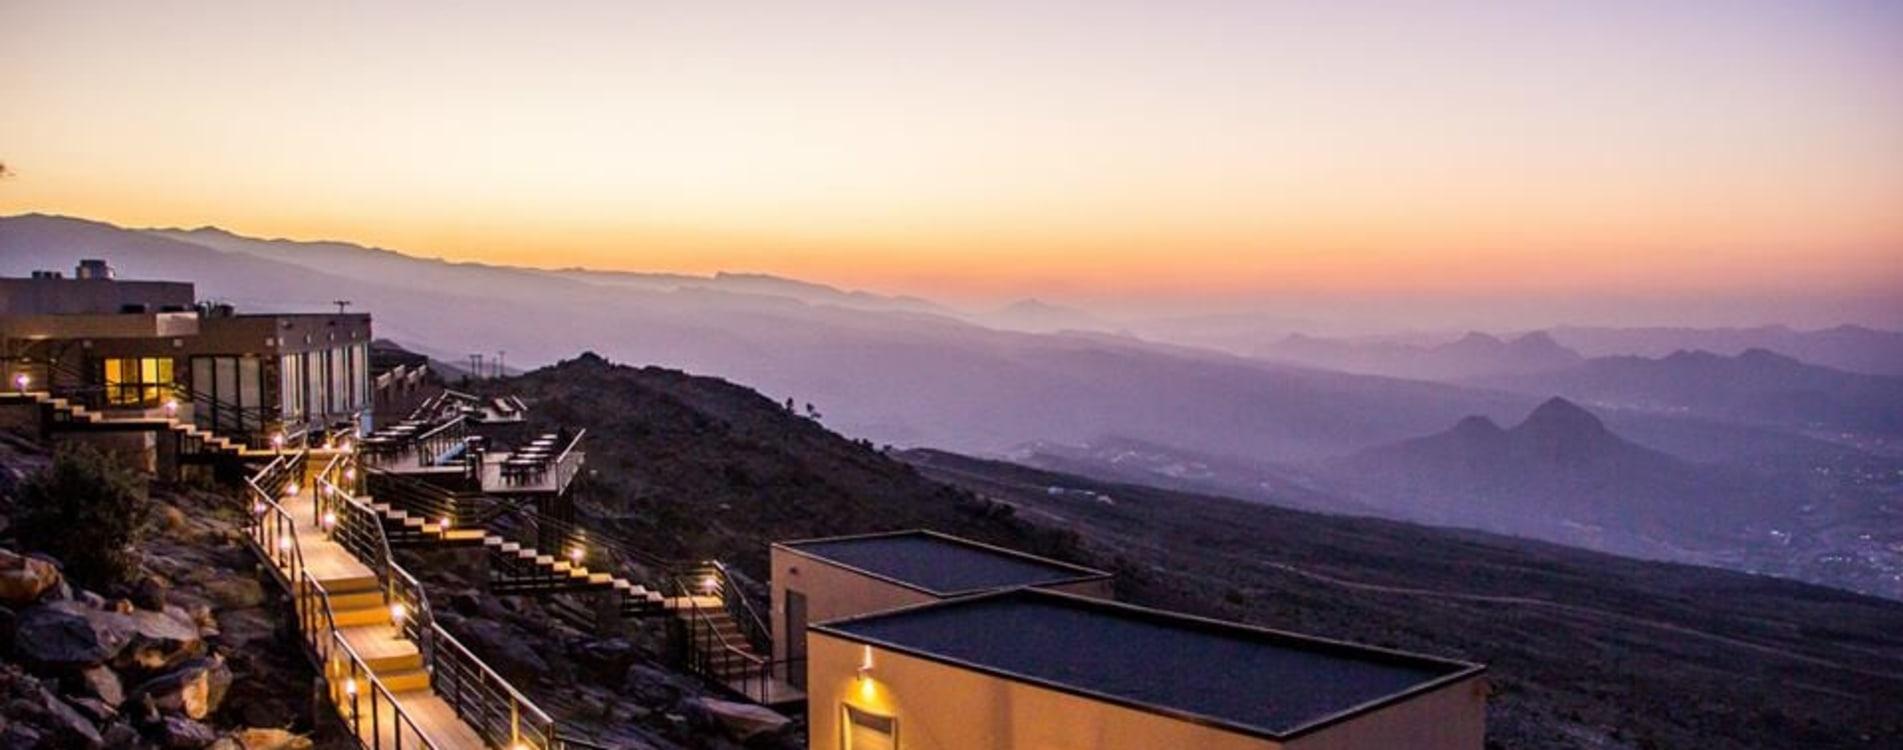 The-View-Oman-Unterkünfte-Steg.jpg